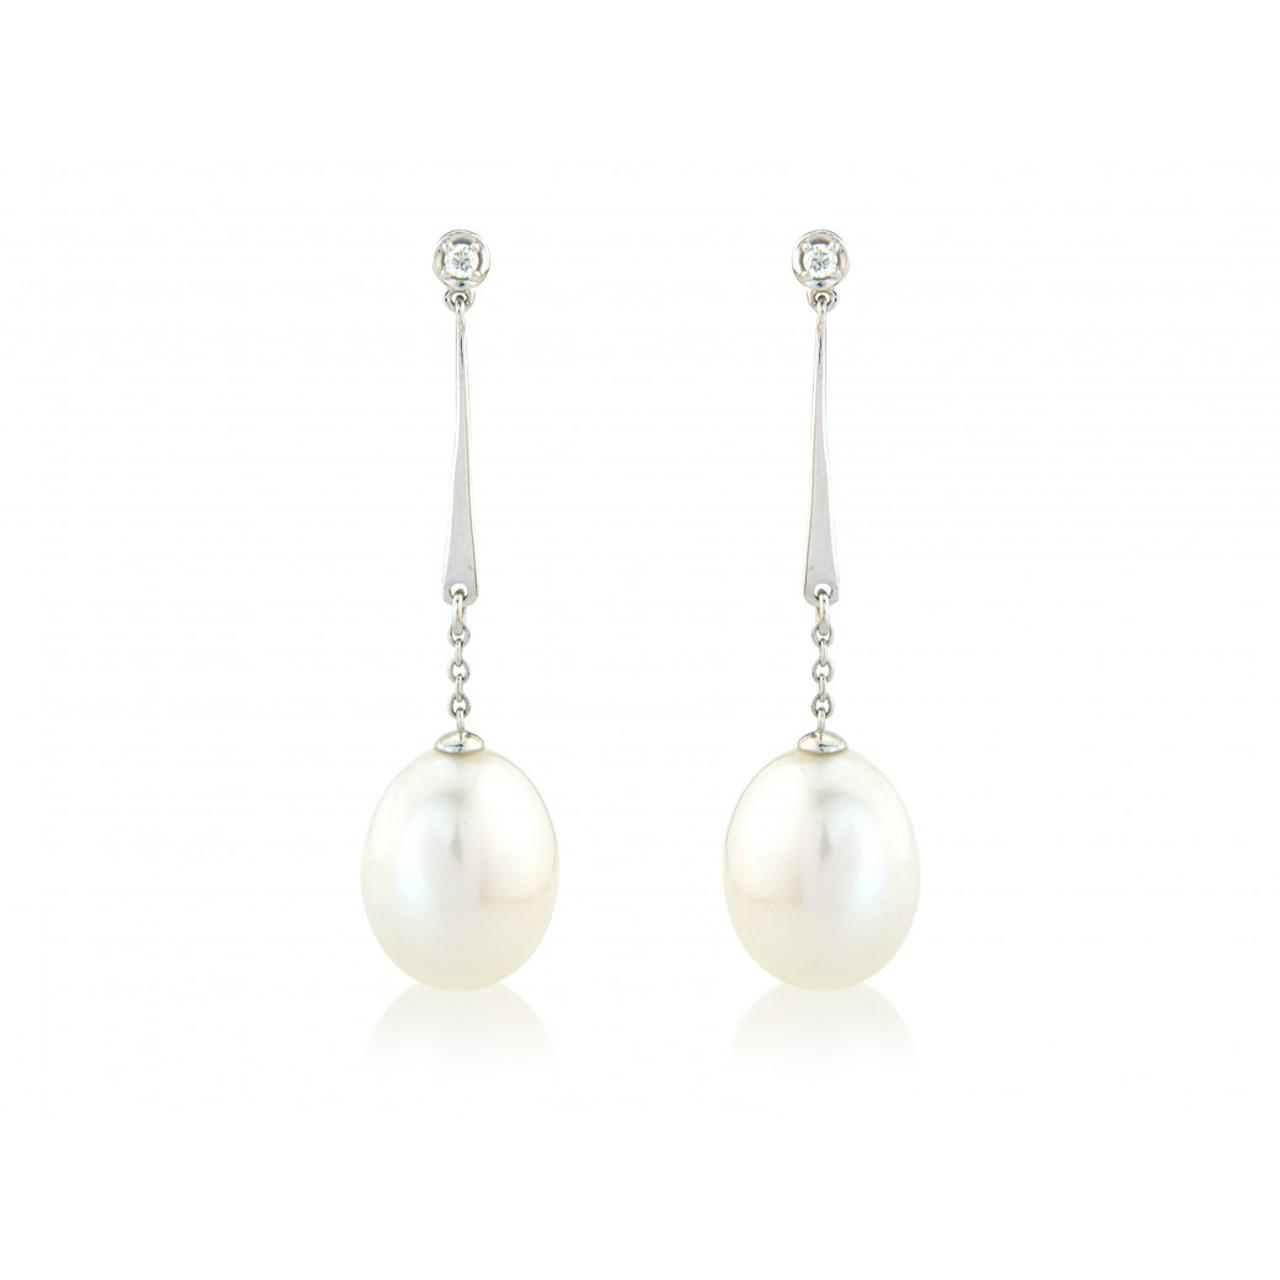 9ct White Gold Diamond & Pearl Drop Earrings